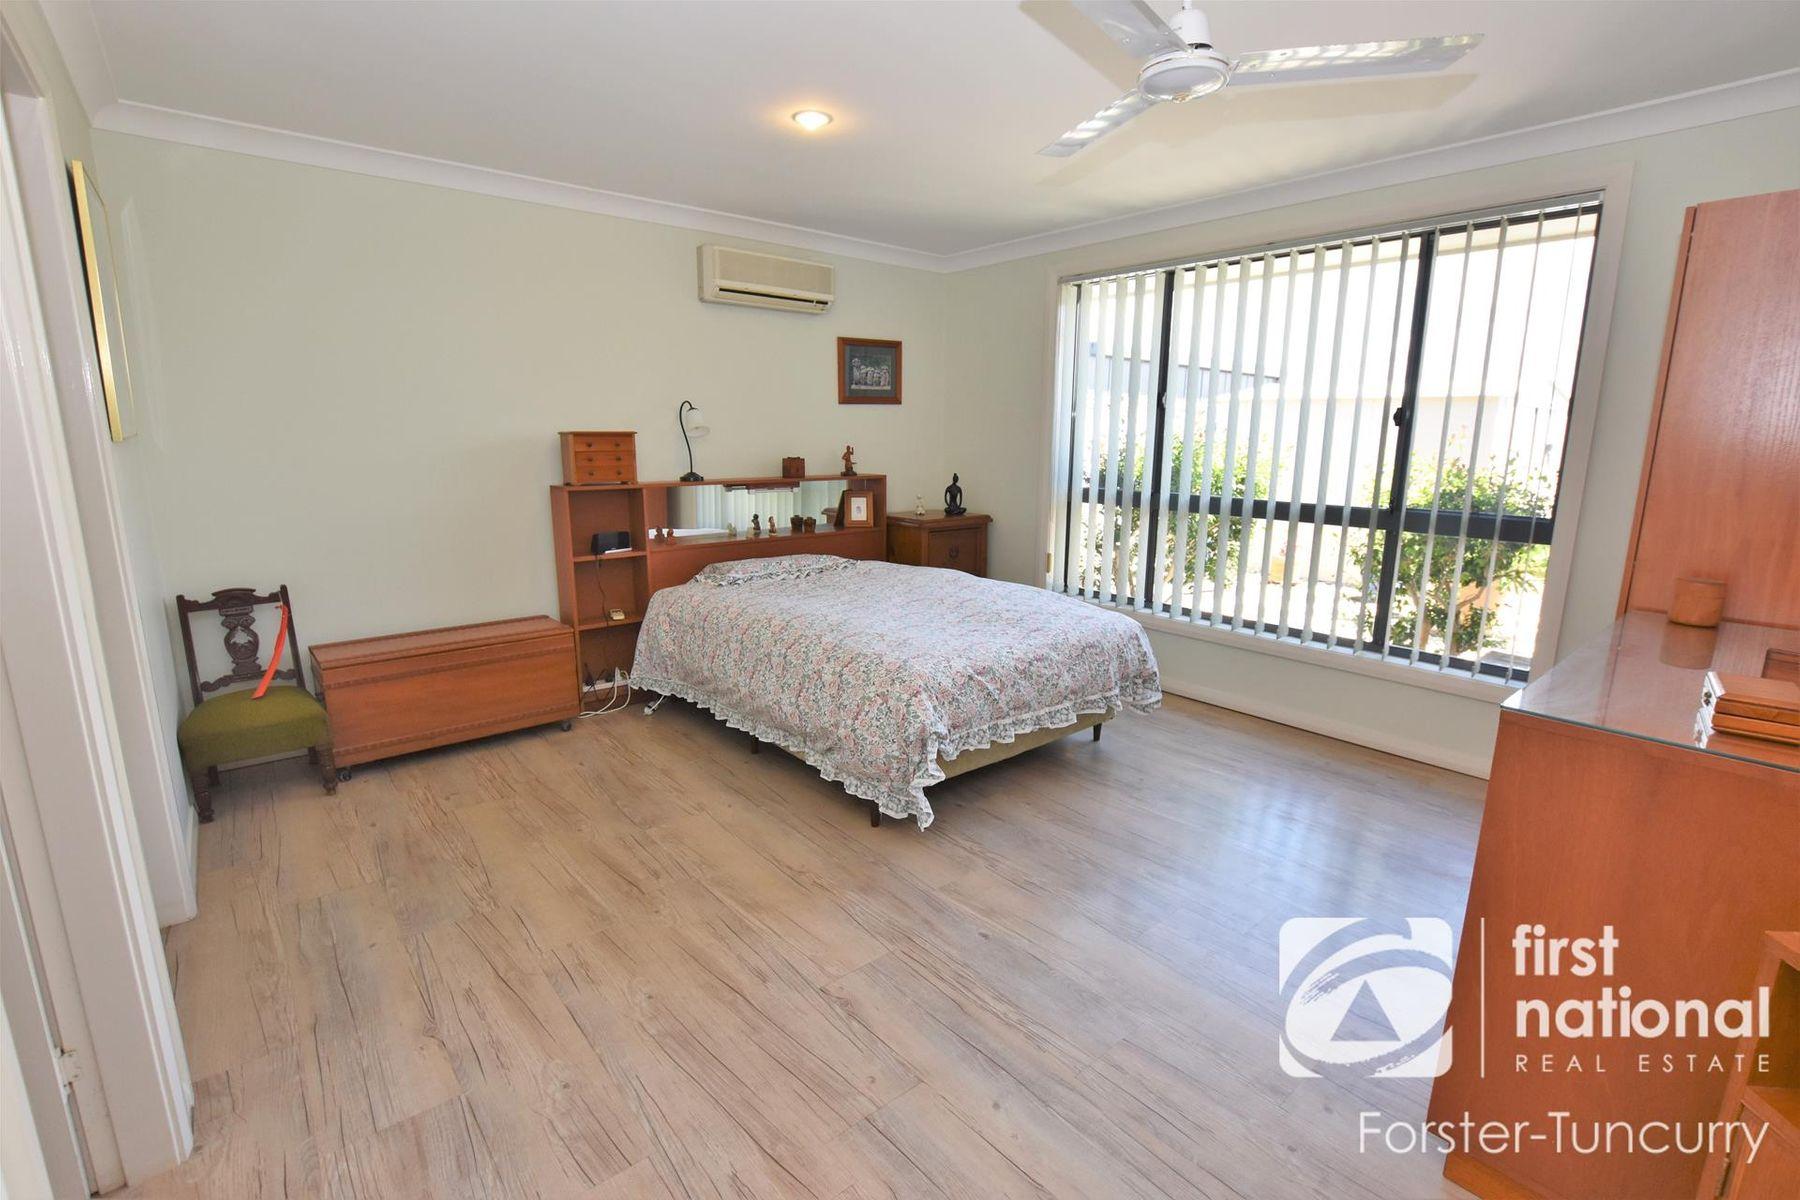 10 Asplenii Crescent, Tuncurry, NSW 2428